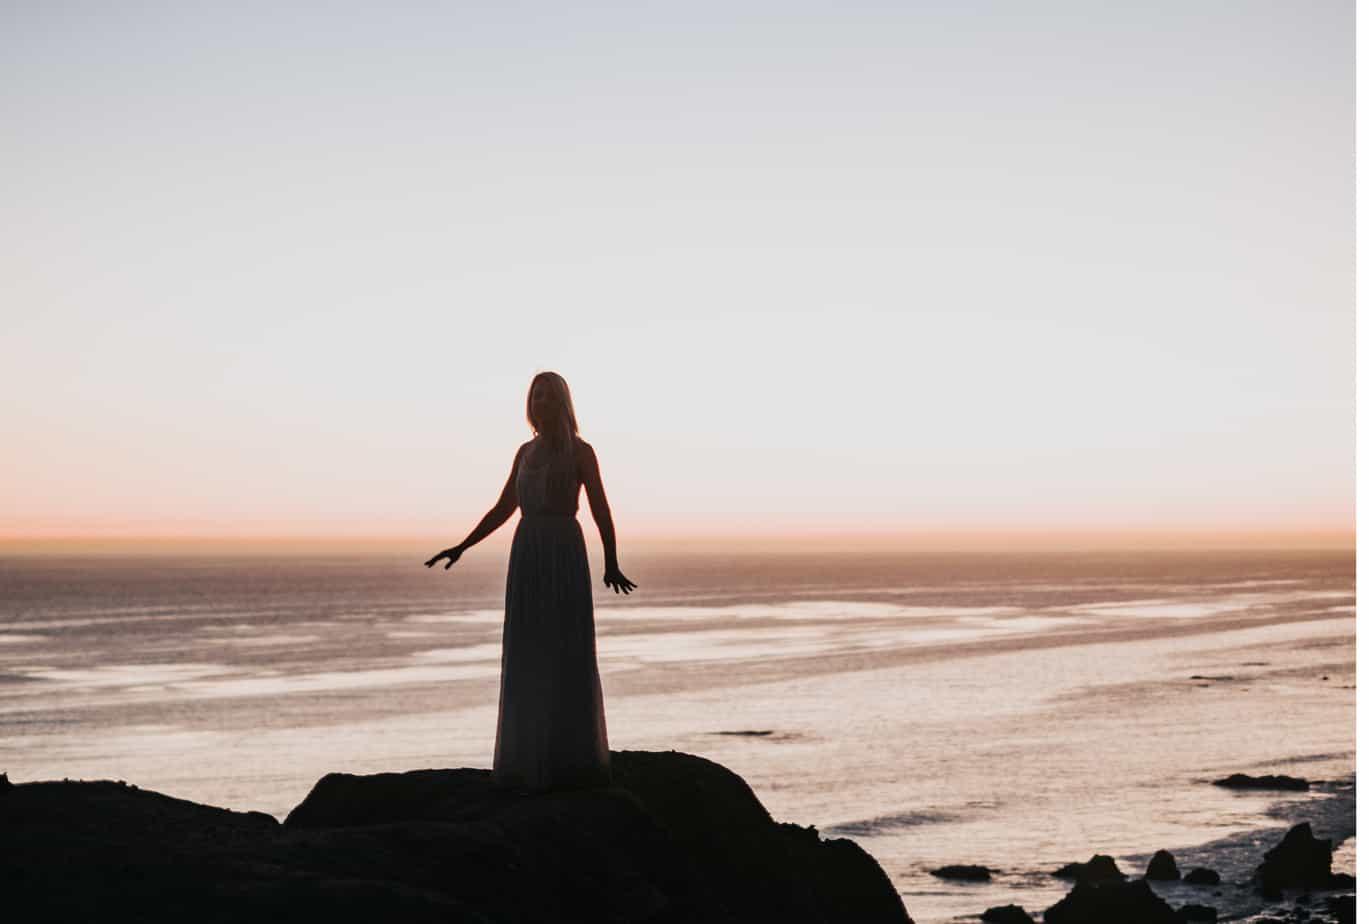 Lady on Rocks